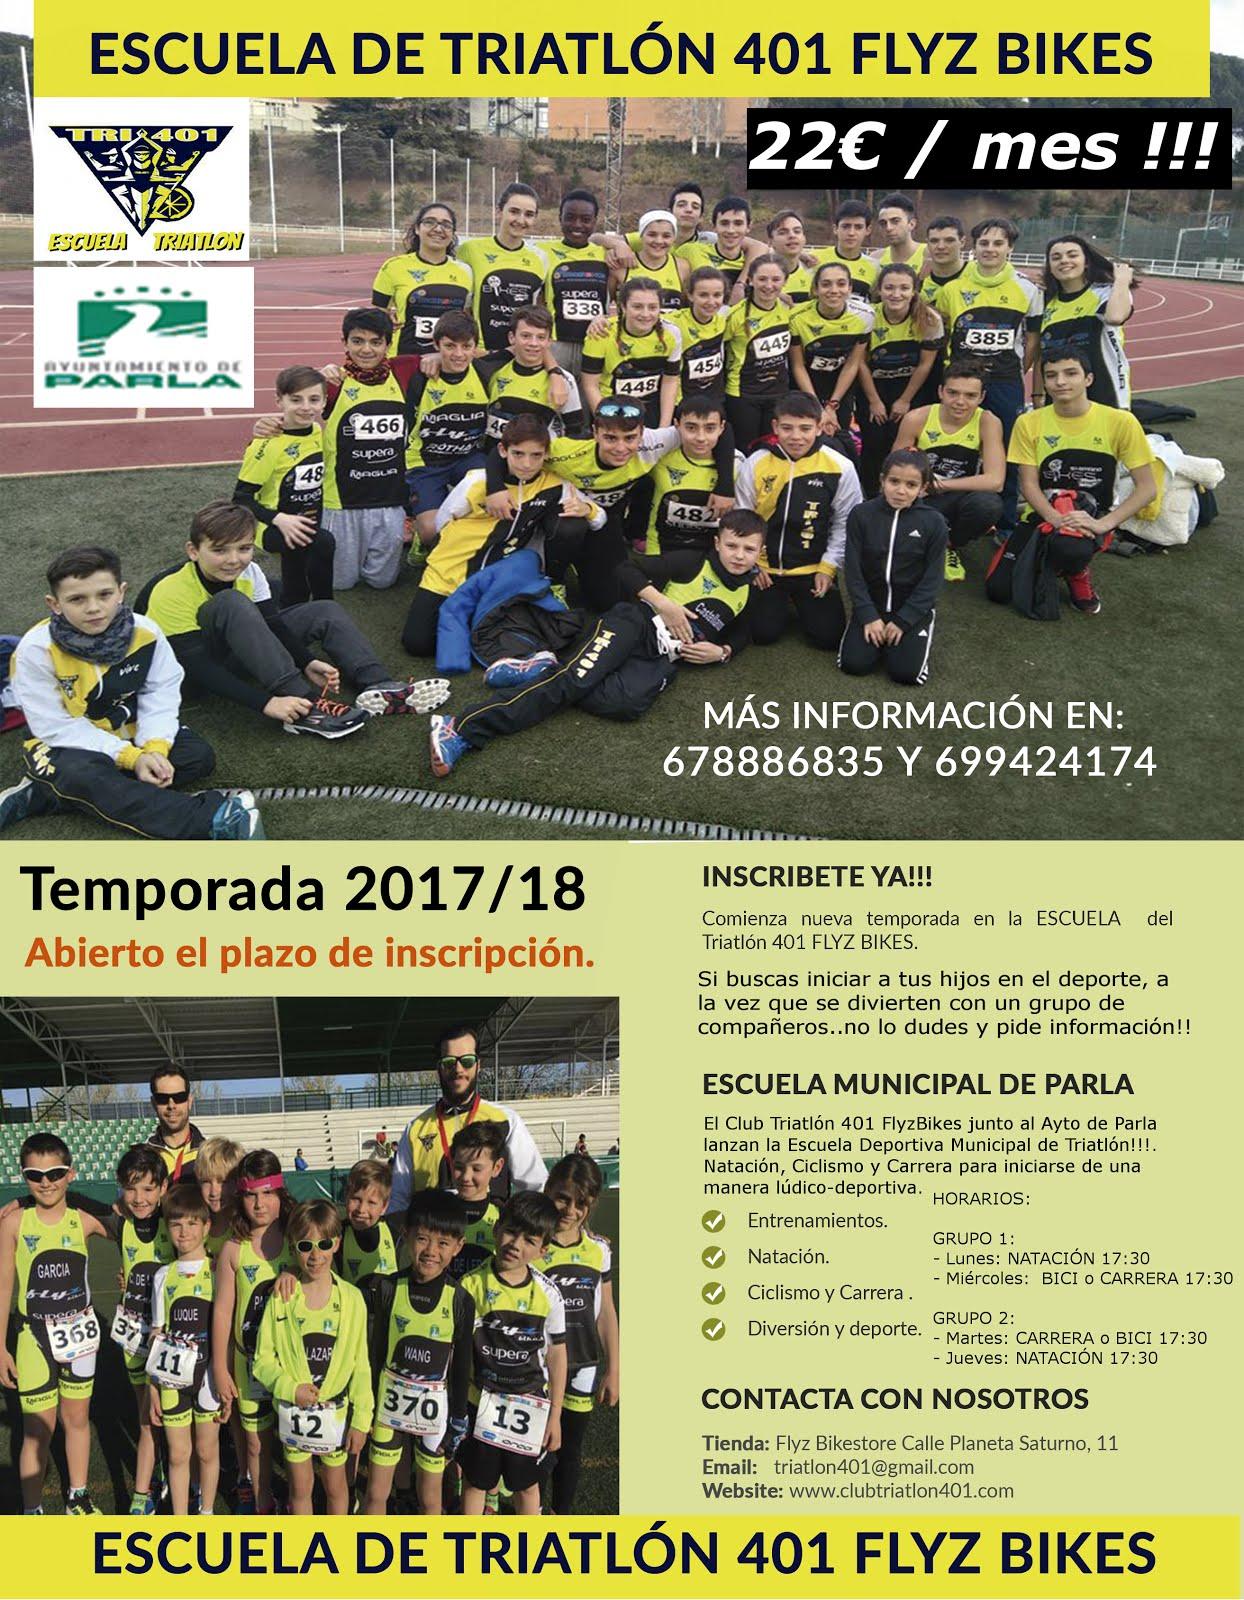 Escuela Deportiva Municipal de Triatlón